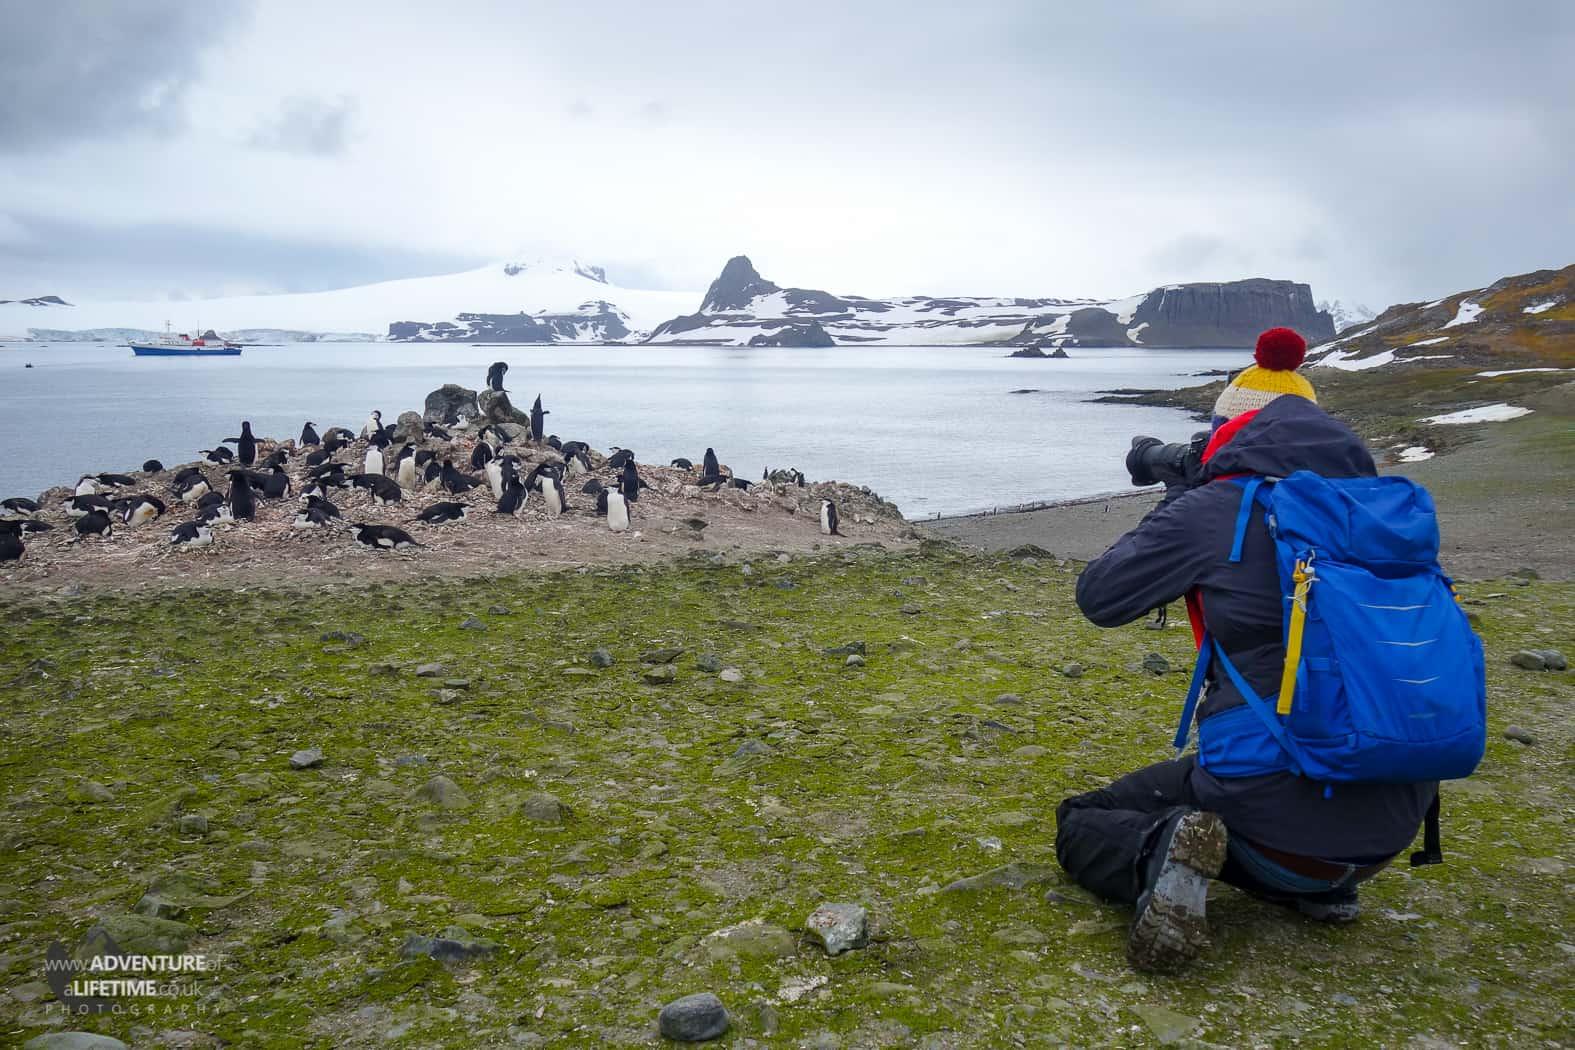 Chinstrap Penguin Rockery on Barrientos Island, Antarctica